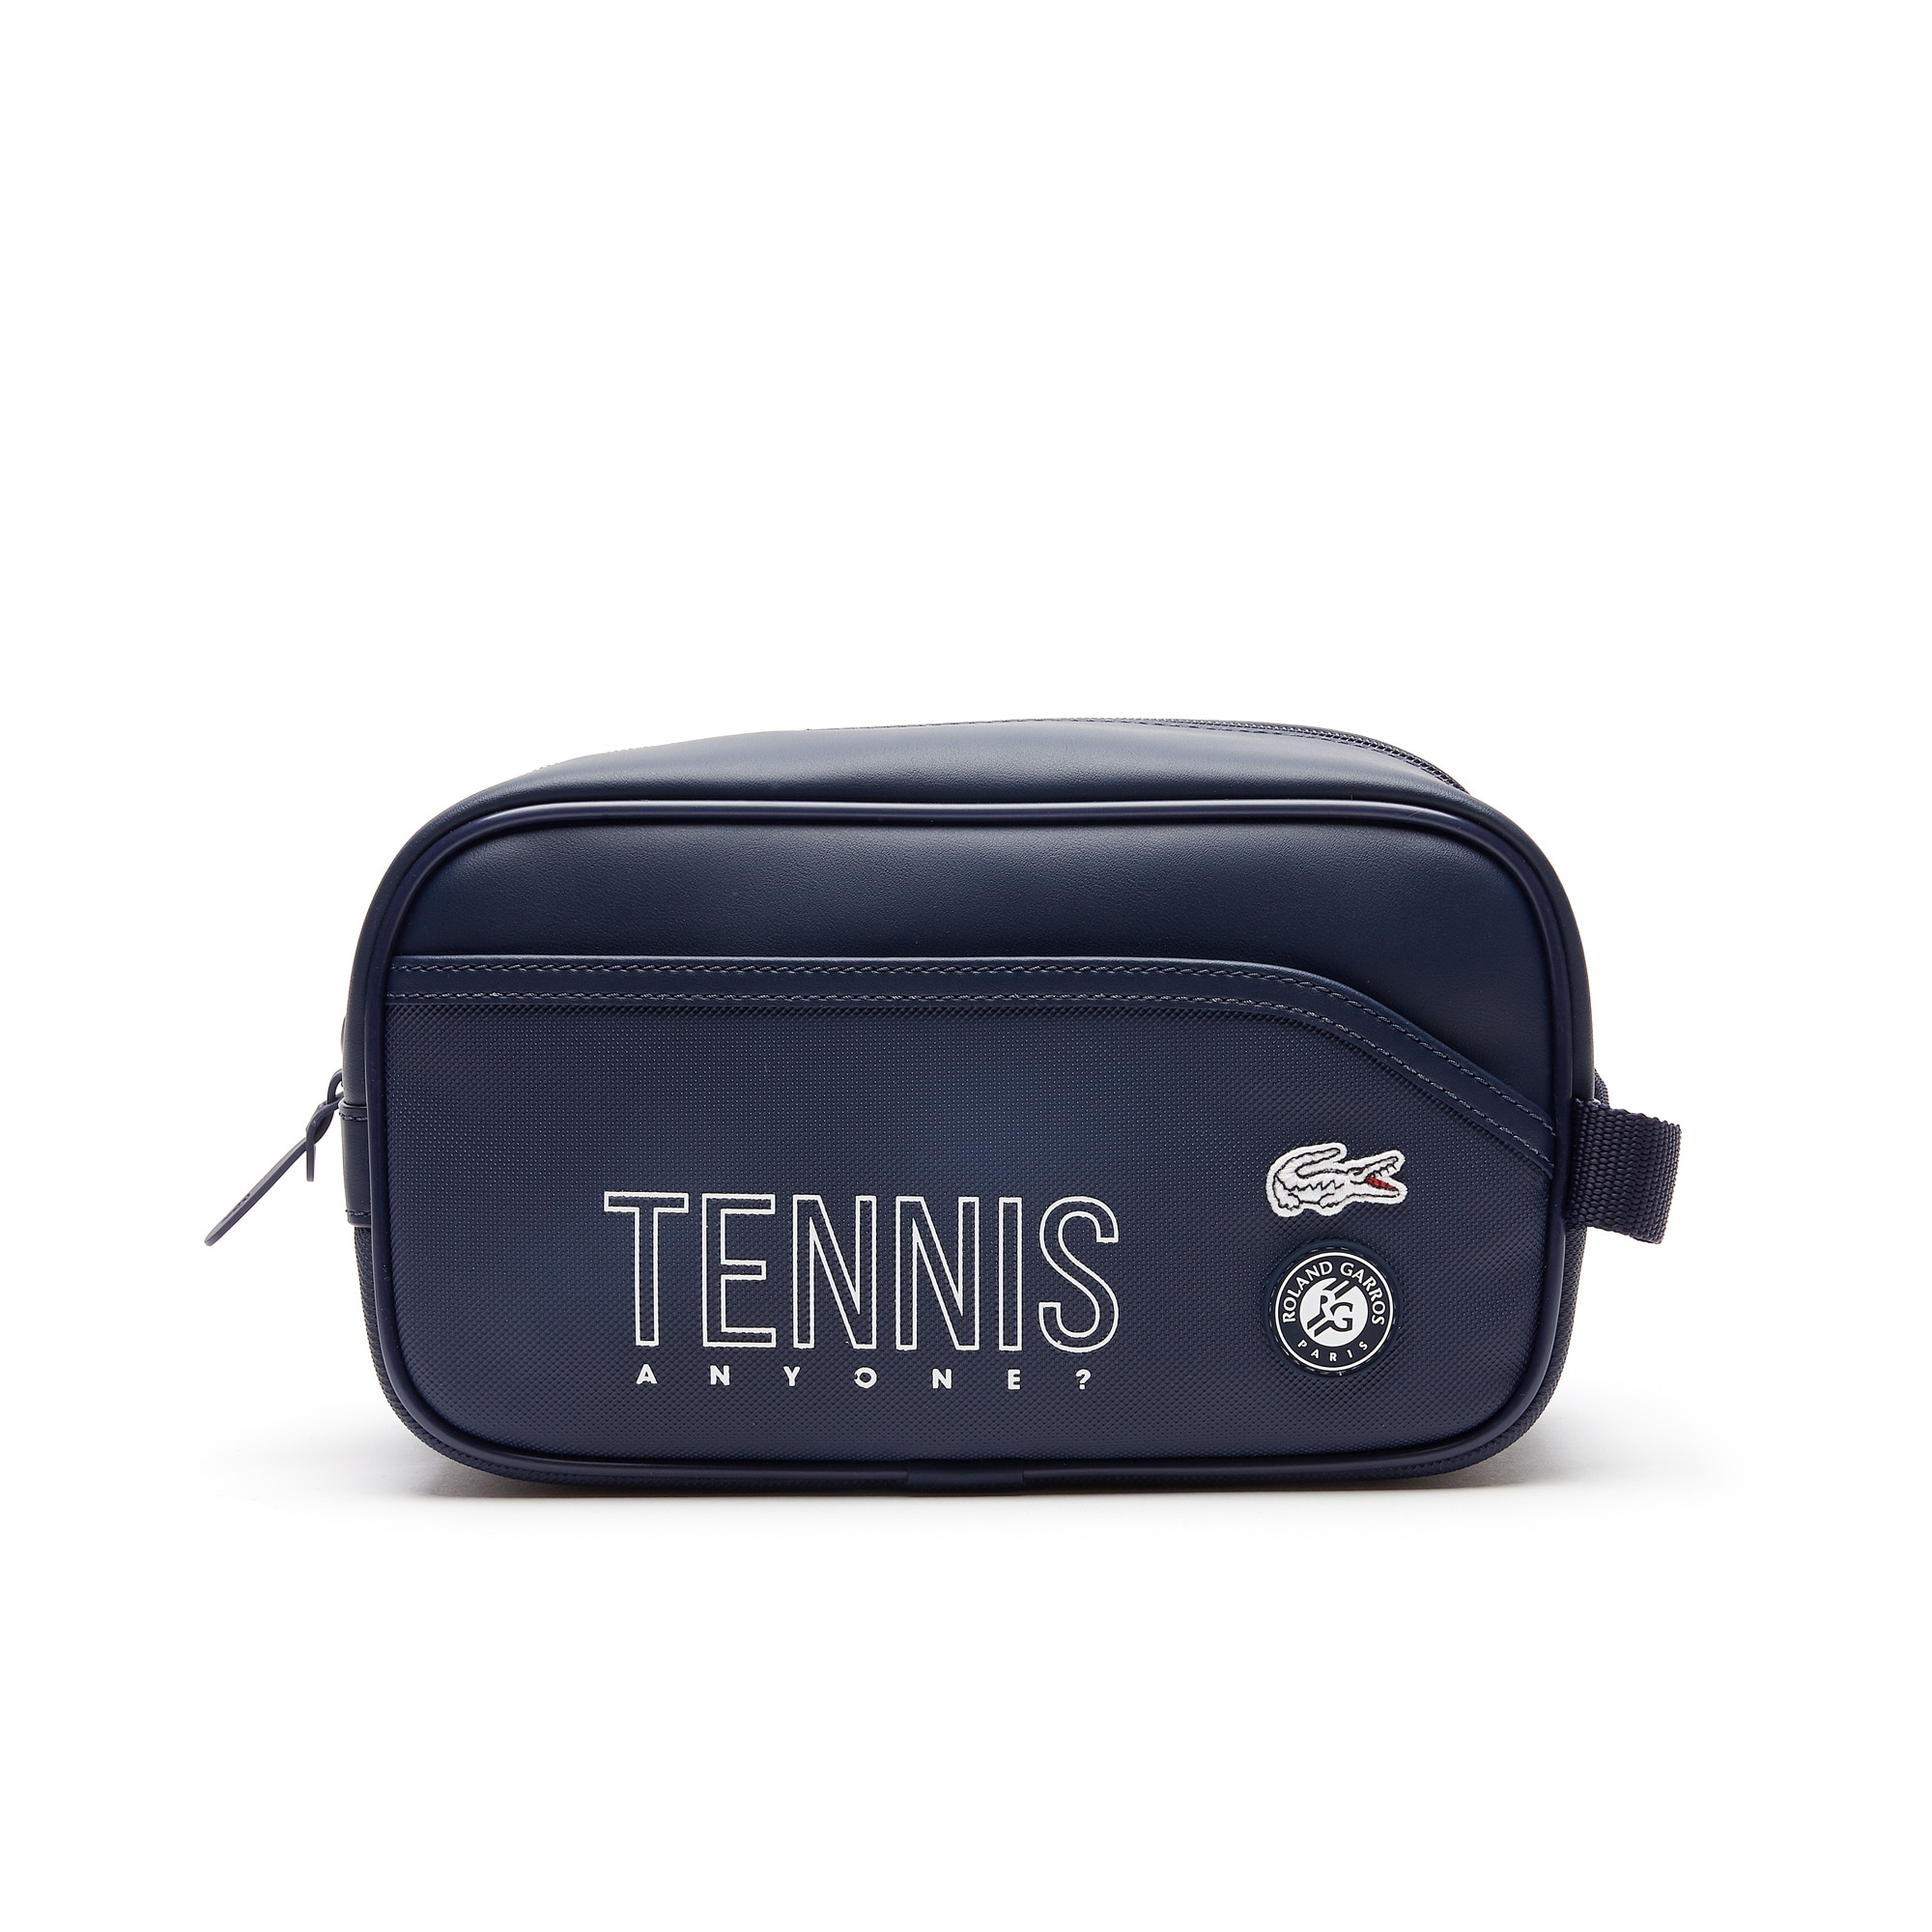 Trousse da toilette Lacoste SPORT Roland Garros con marchio